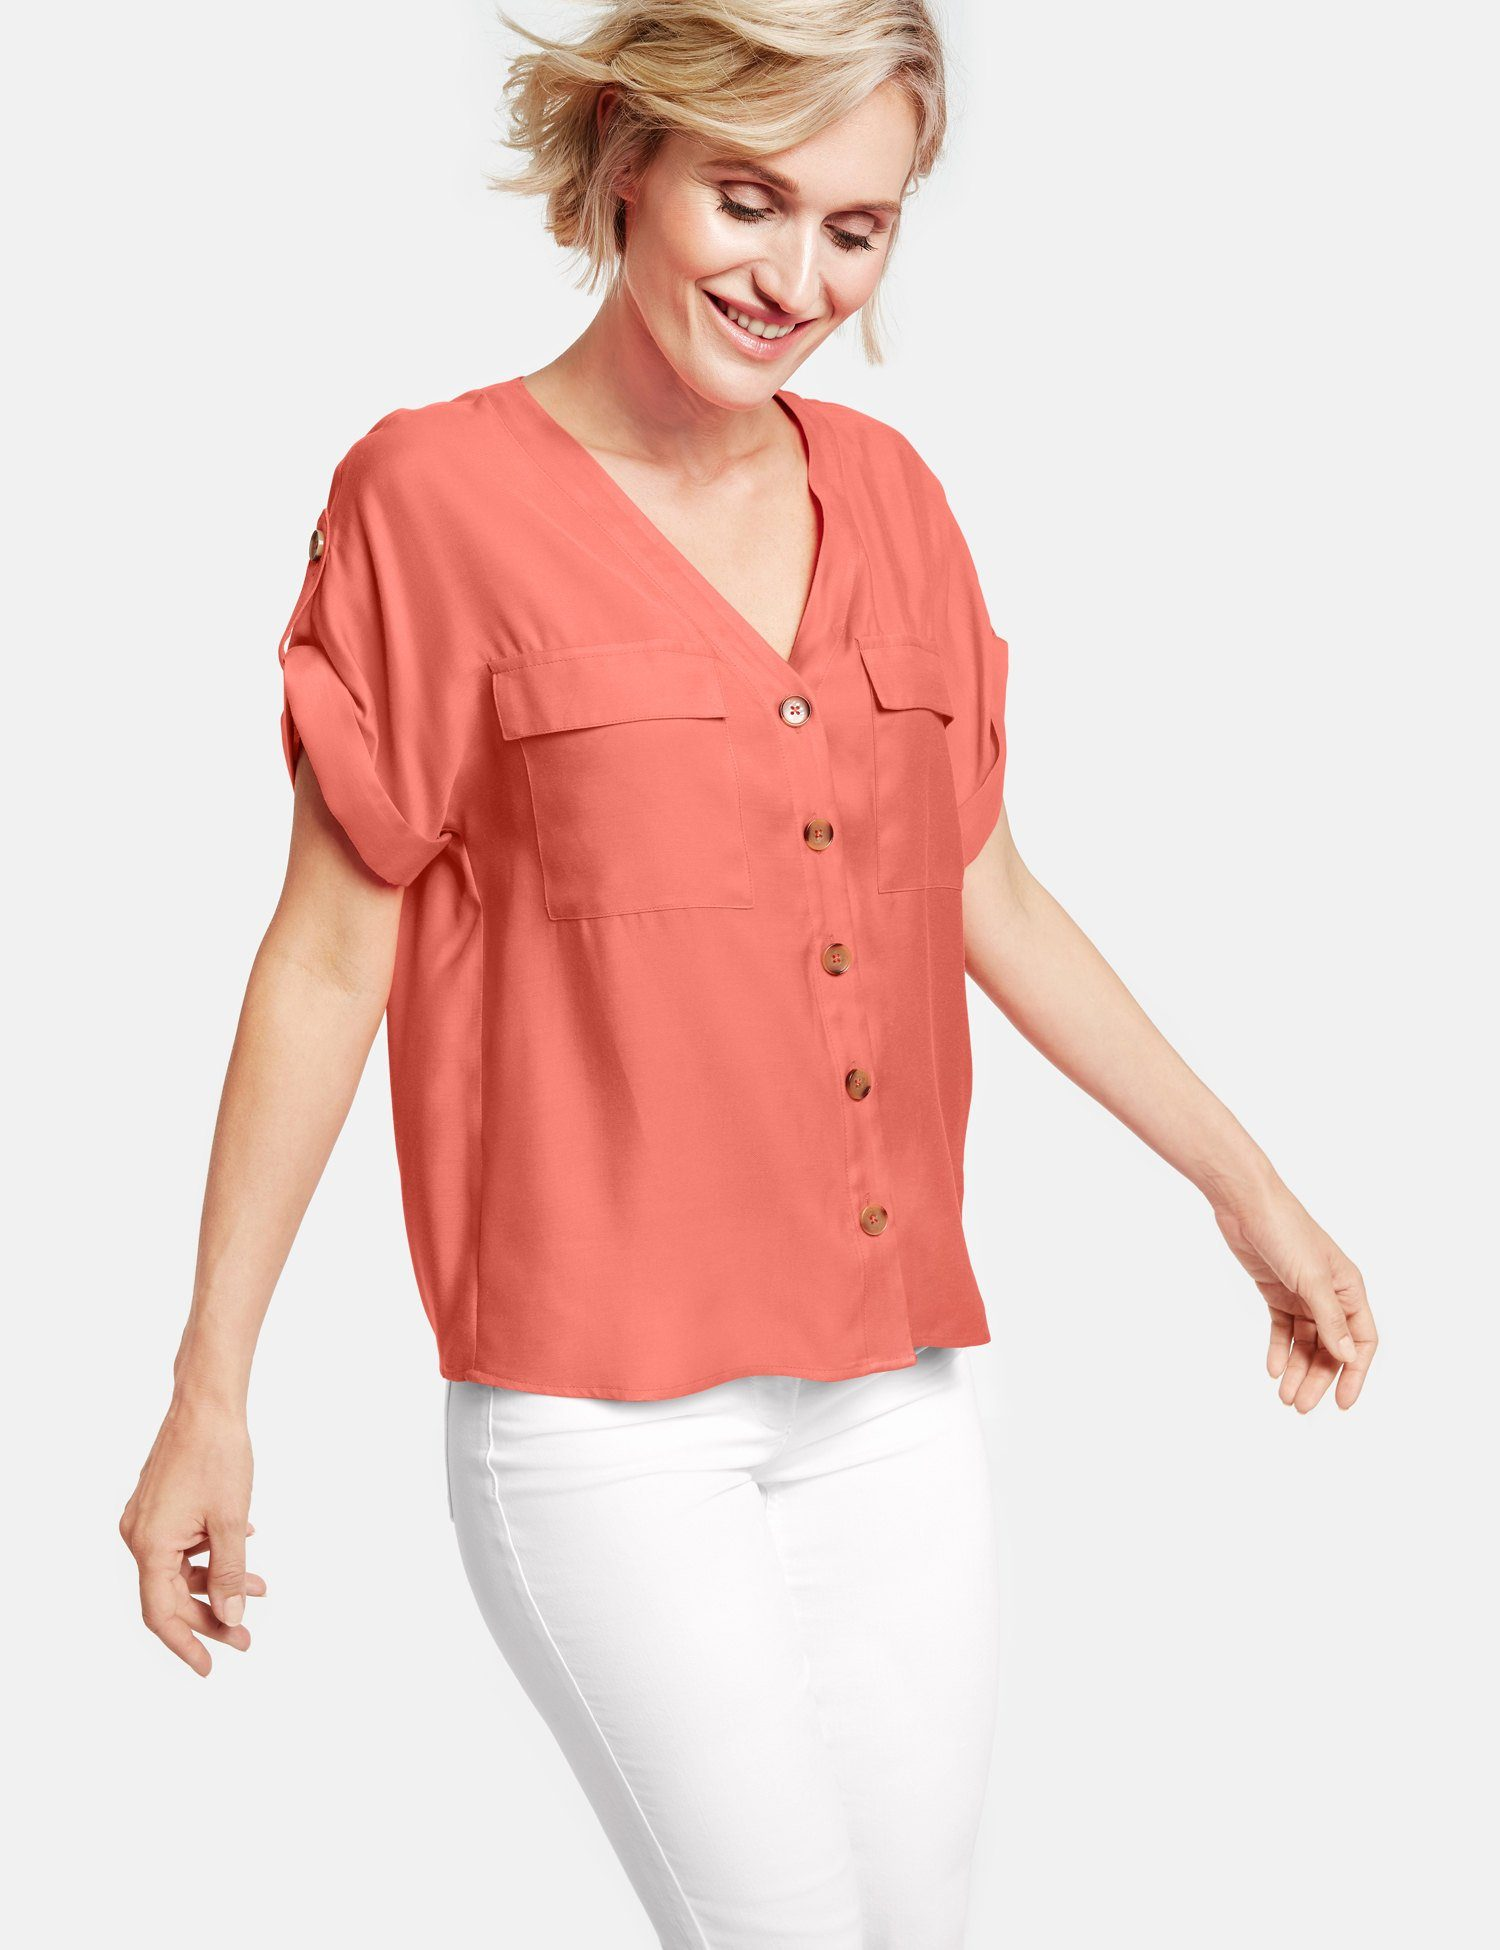 GERRY WEBER Bluse 1/2 Arm Bluse aus Viskose